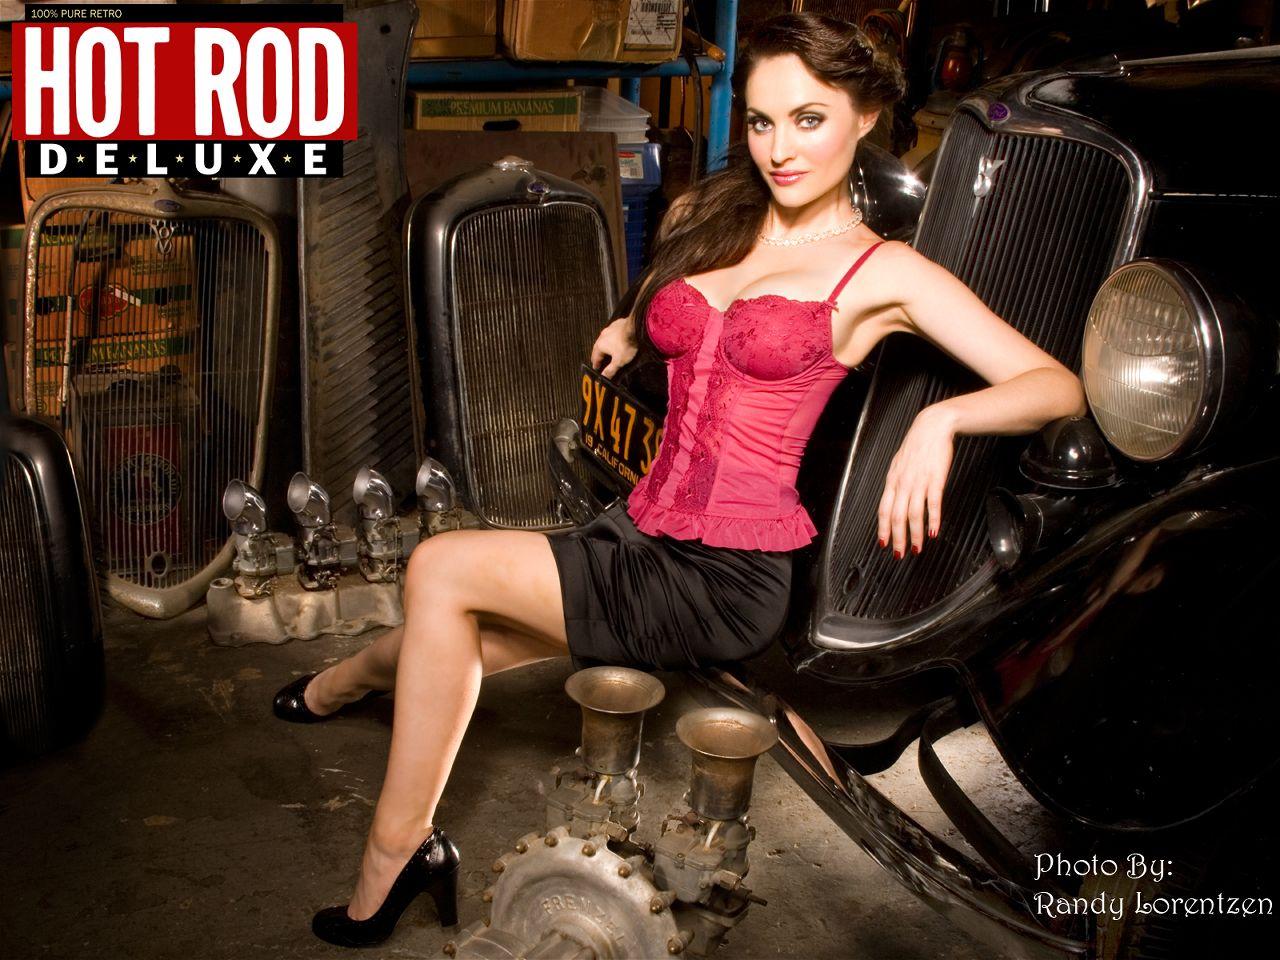 Auto-Kalender mit Sex-Appeal: US Cars & Girls 2015